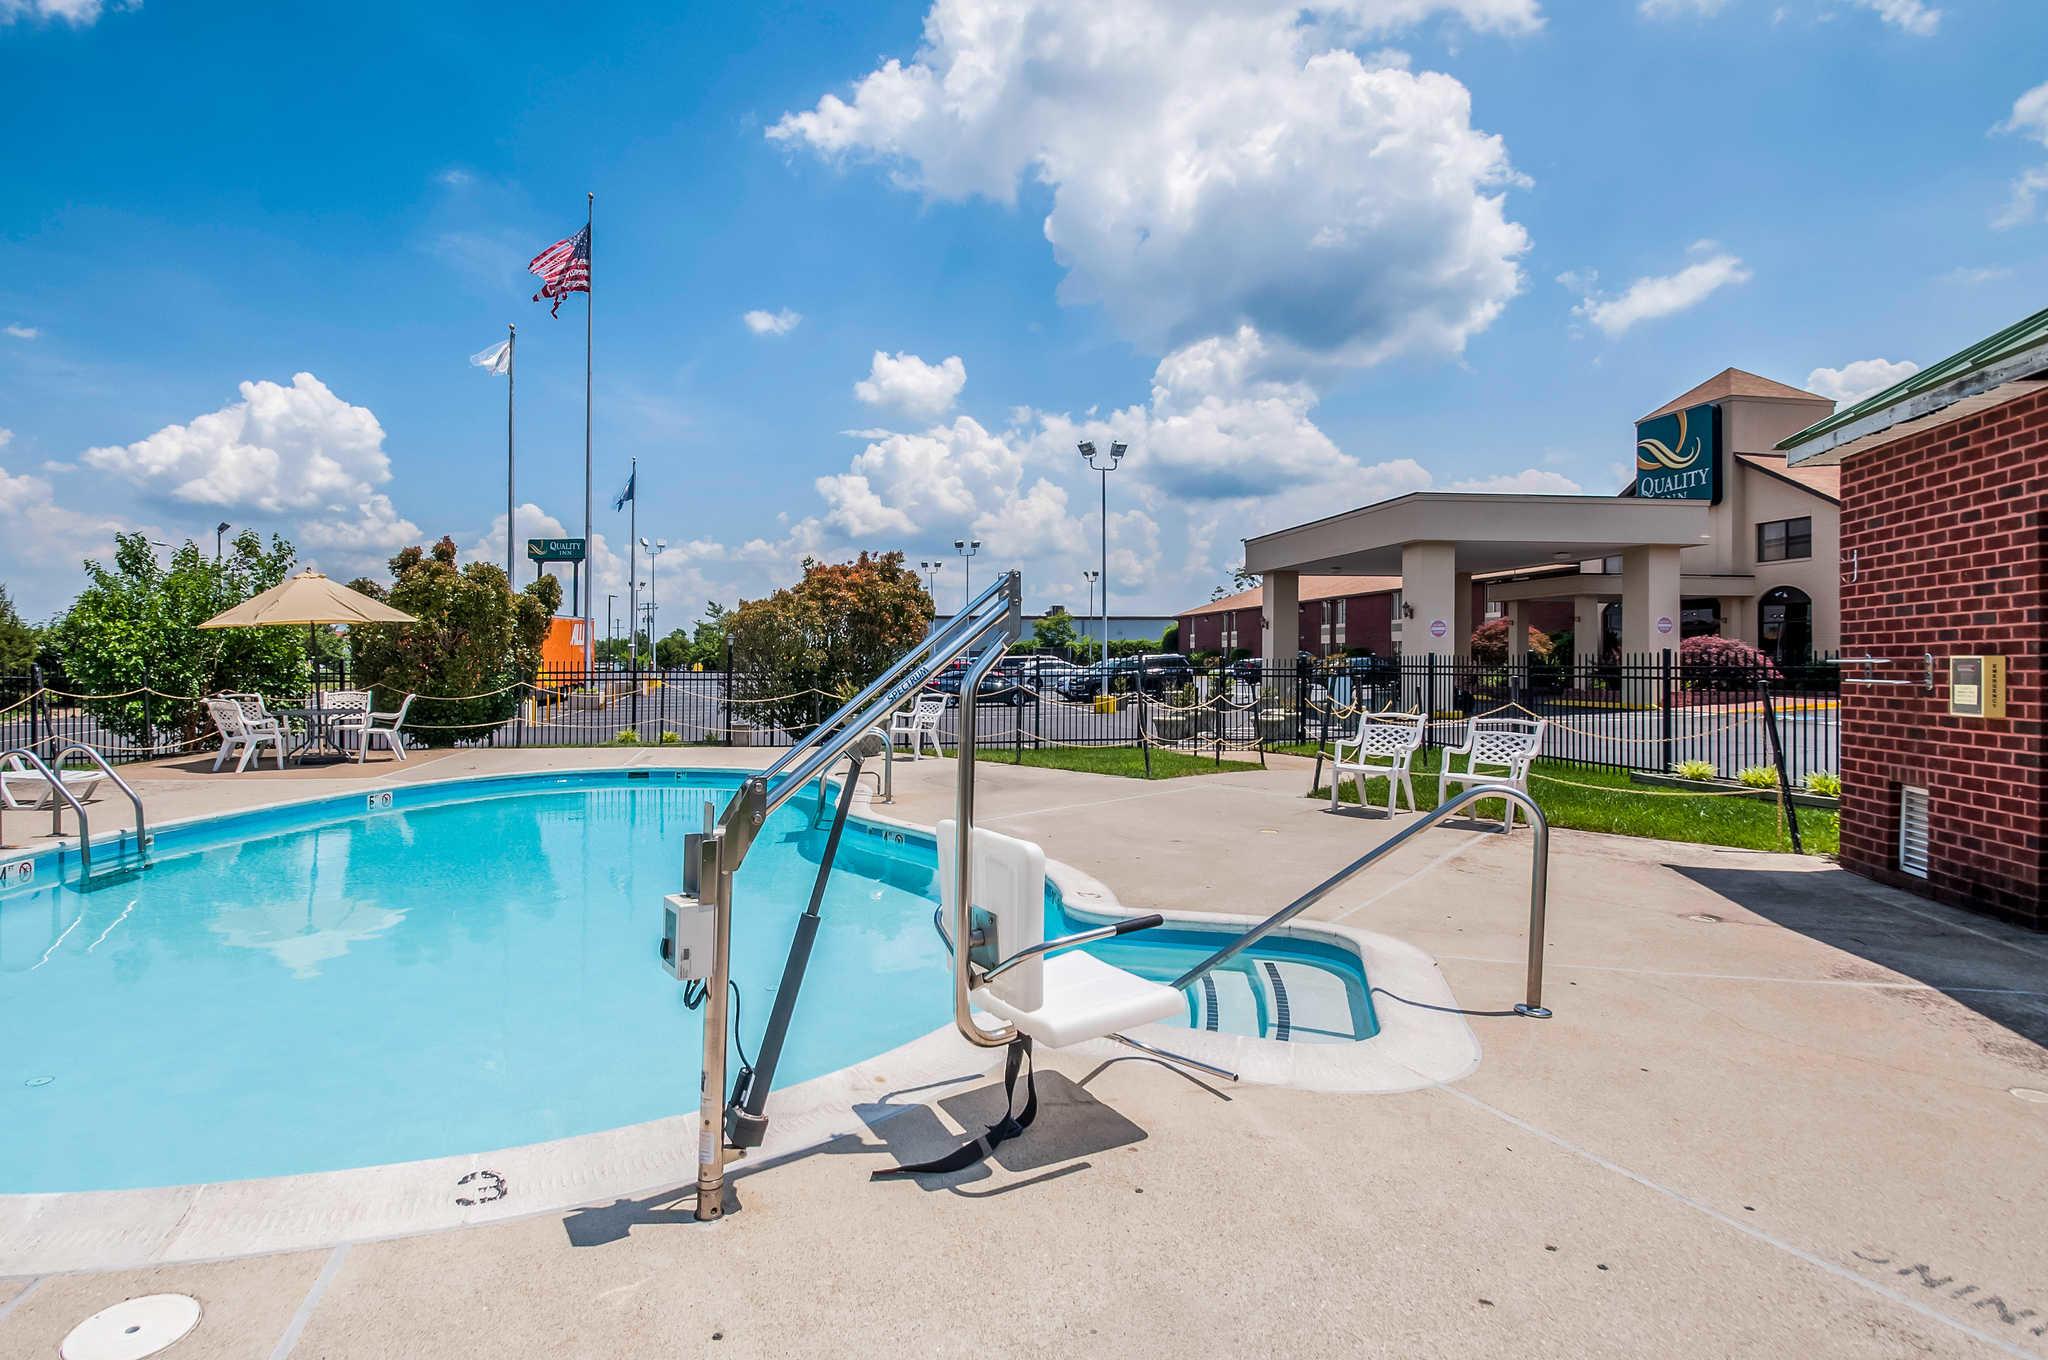 Quality Inn near Potomac Mills image 22